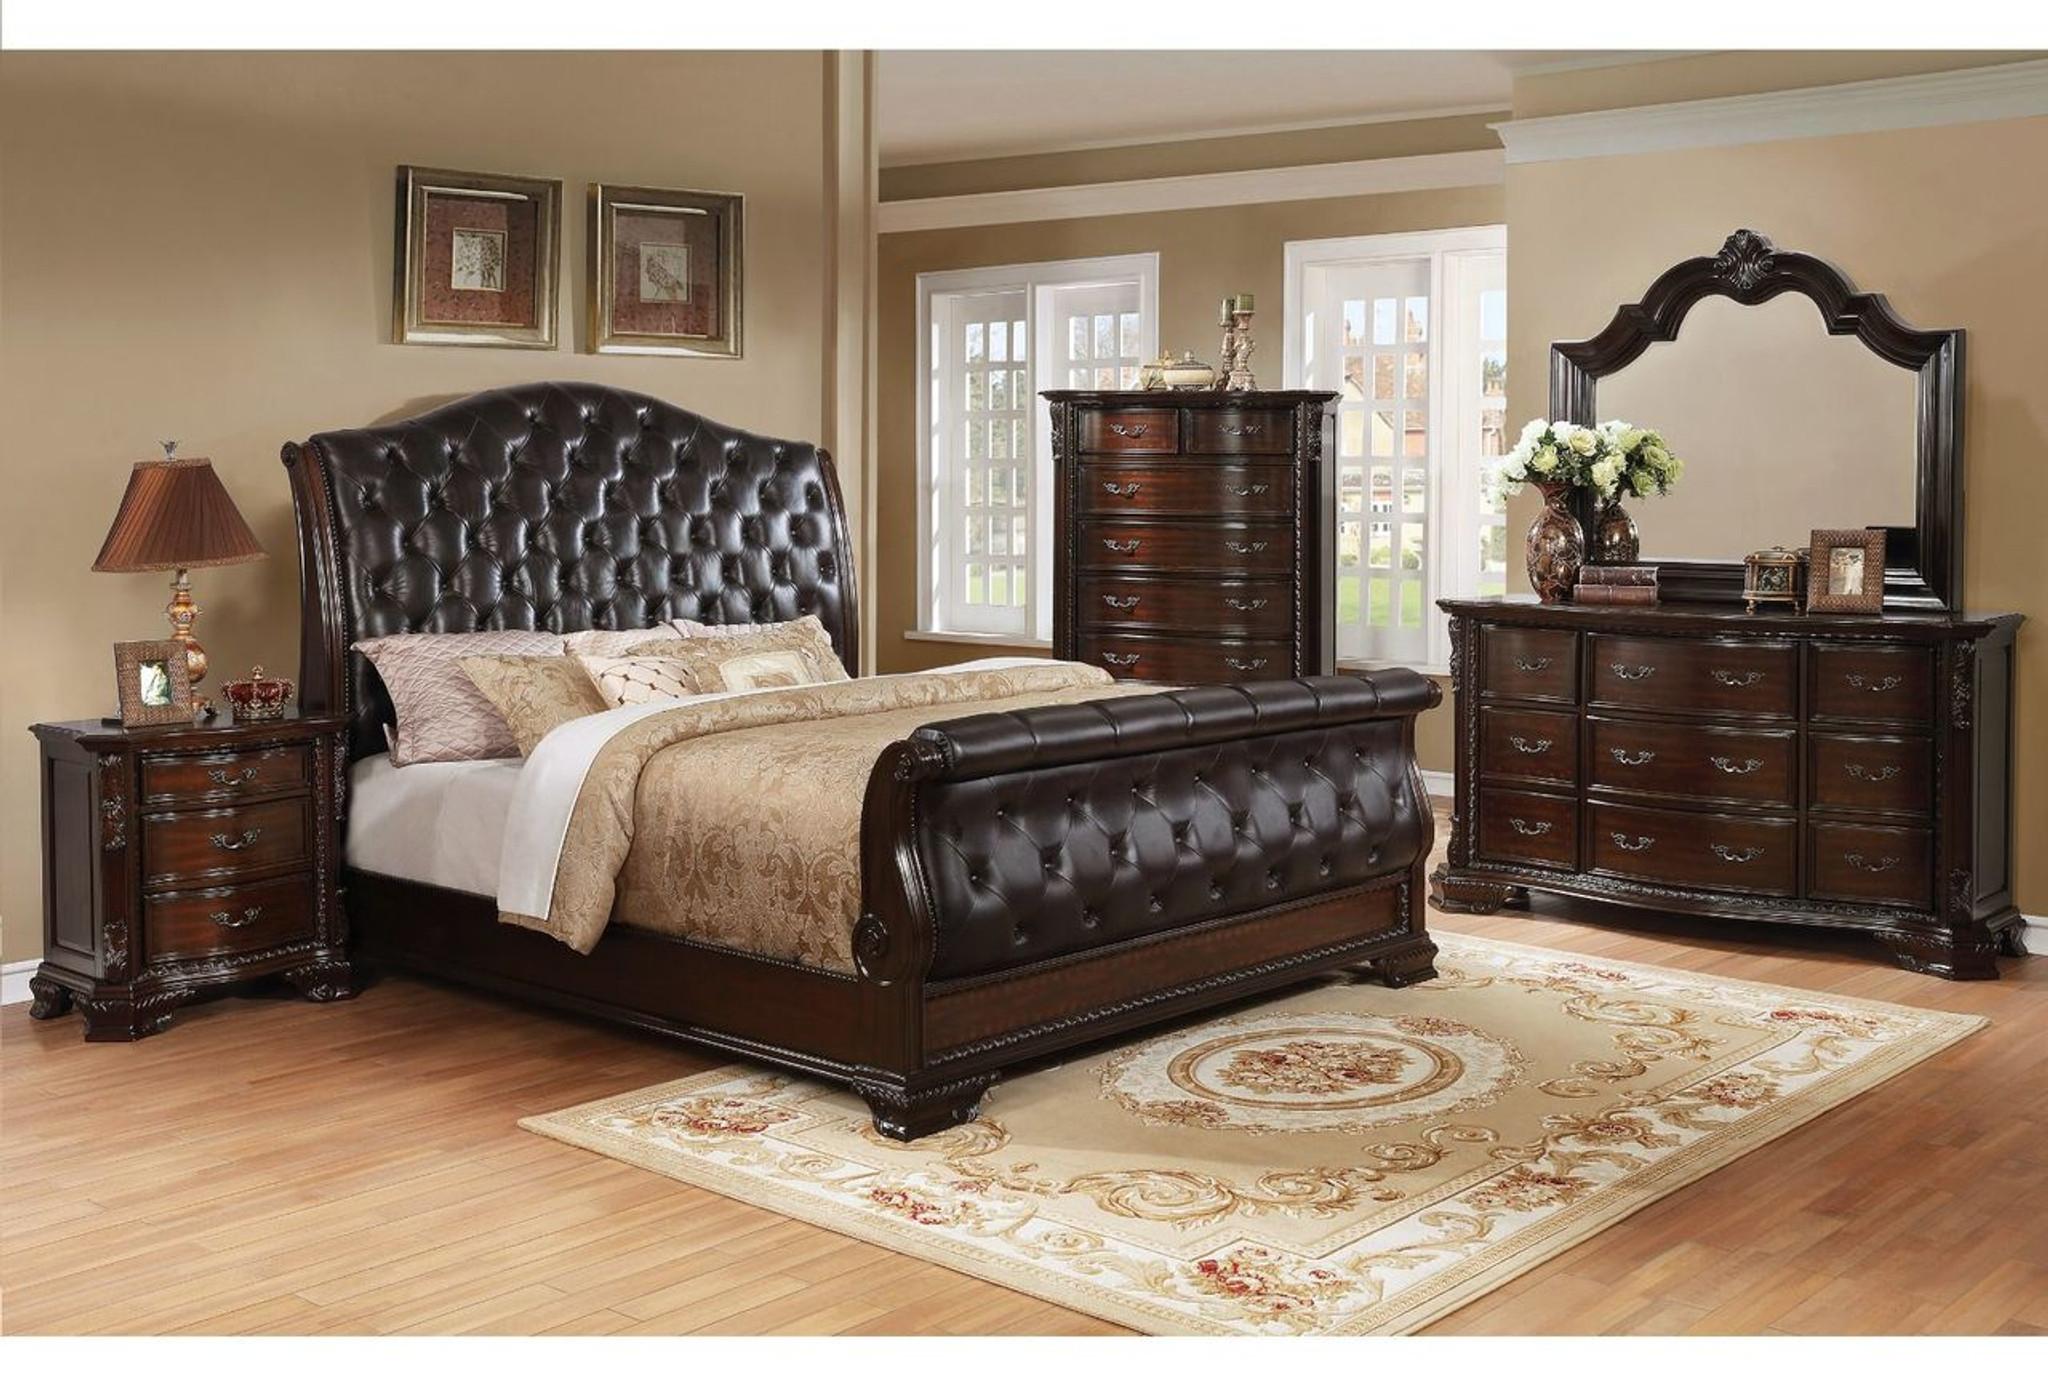 B1100 88 6 Pcs Sheffield Sleigh Bedroom Set By Crown Mark